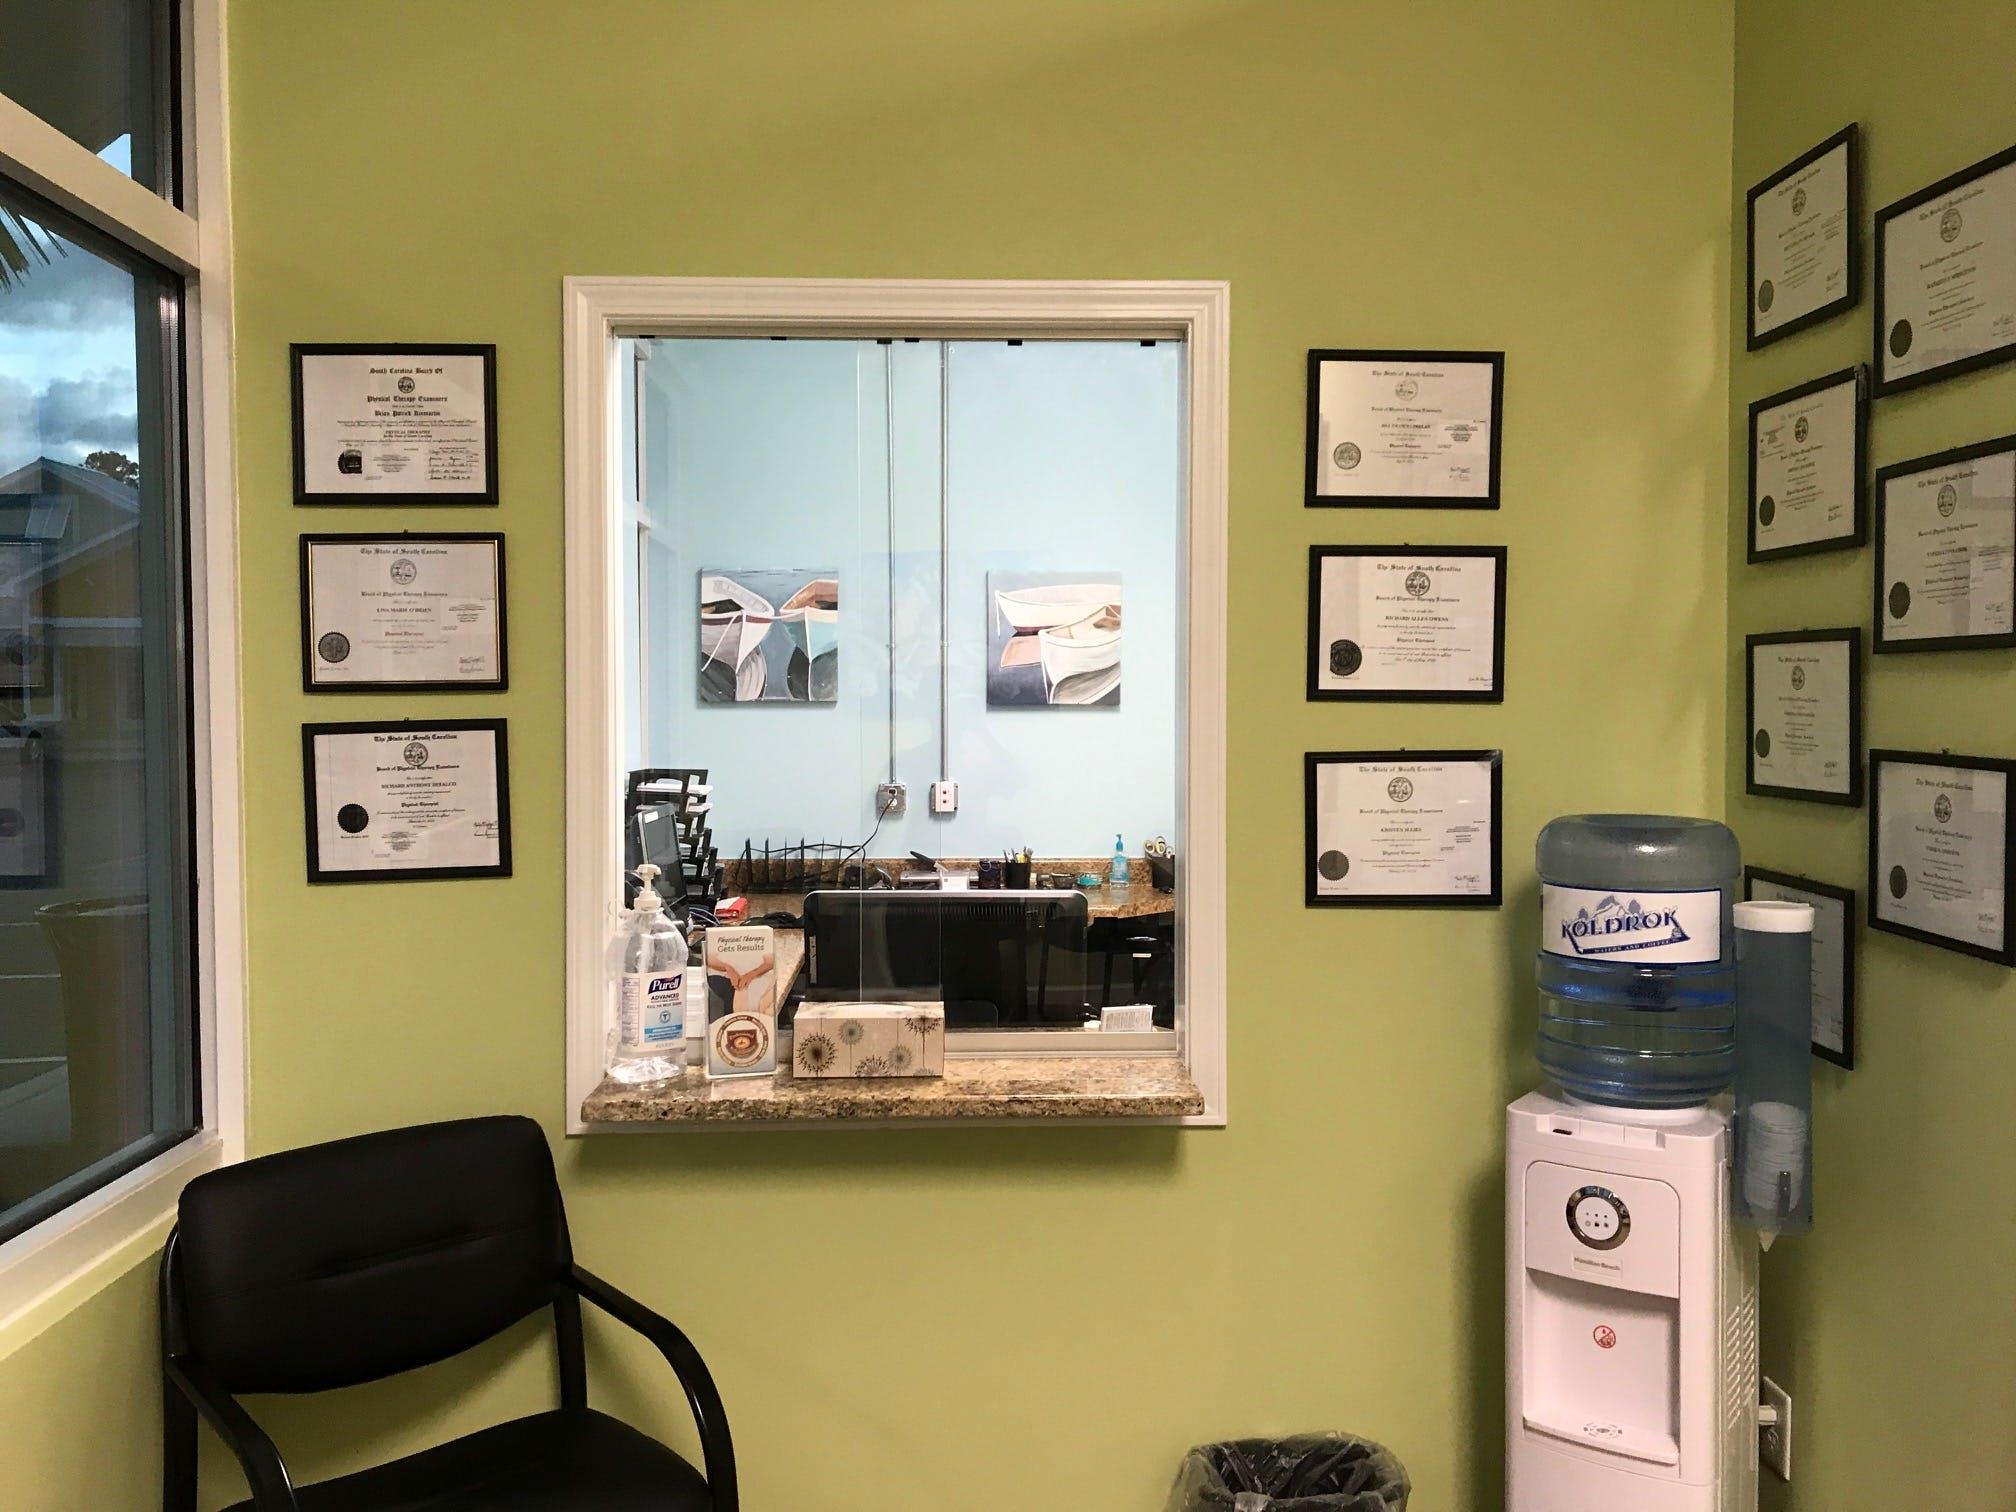 Professional Rehabilitation Services   Physical Therapy   Prince Creek Publix Village Shops   Murrells Inlet SC